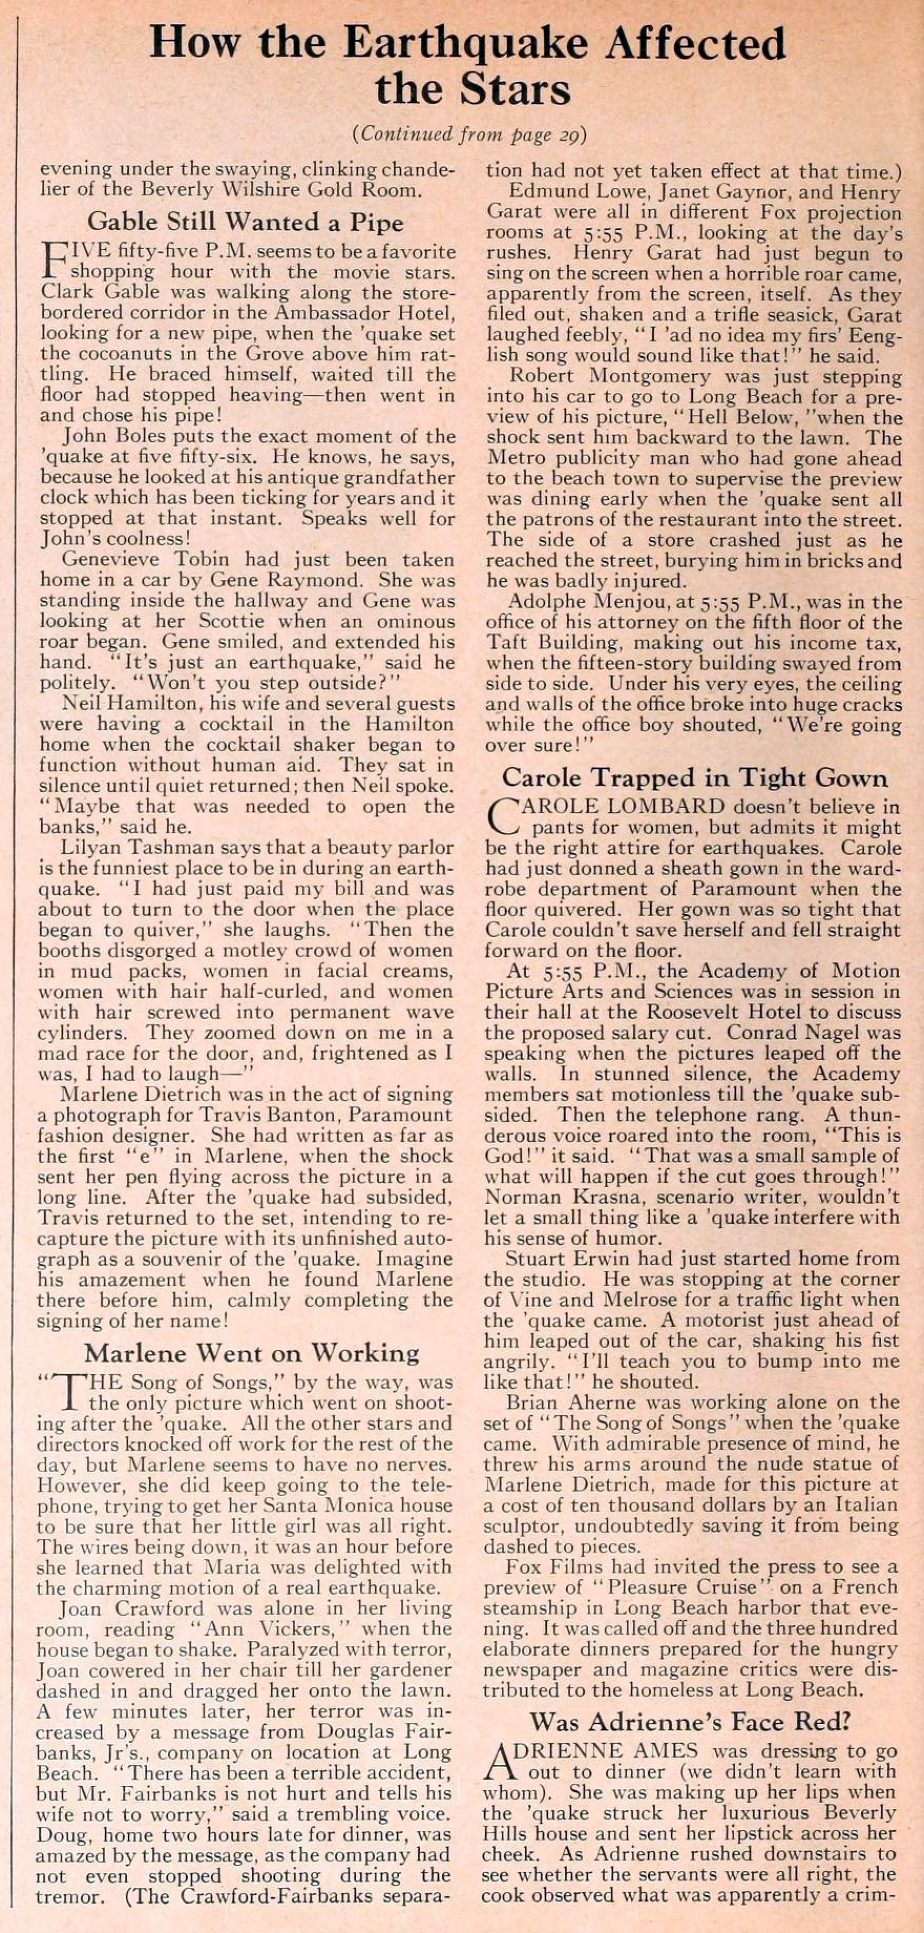 carole lombard motion picture june 1933 earthquake 02a